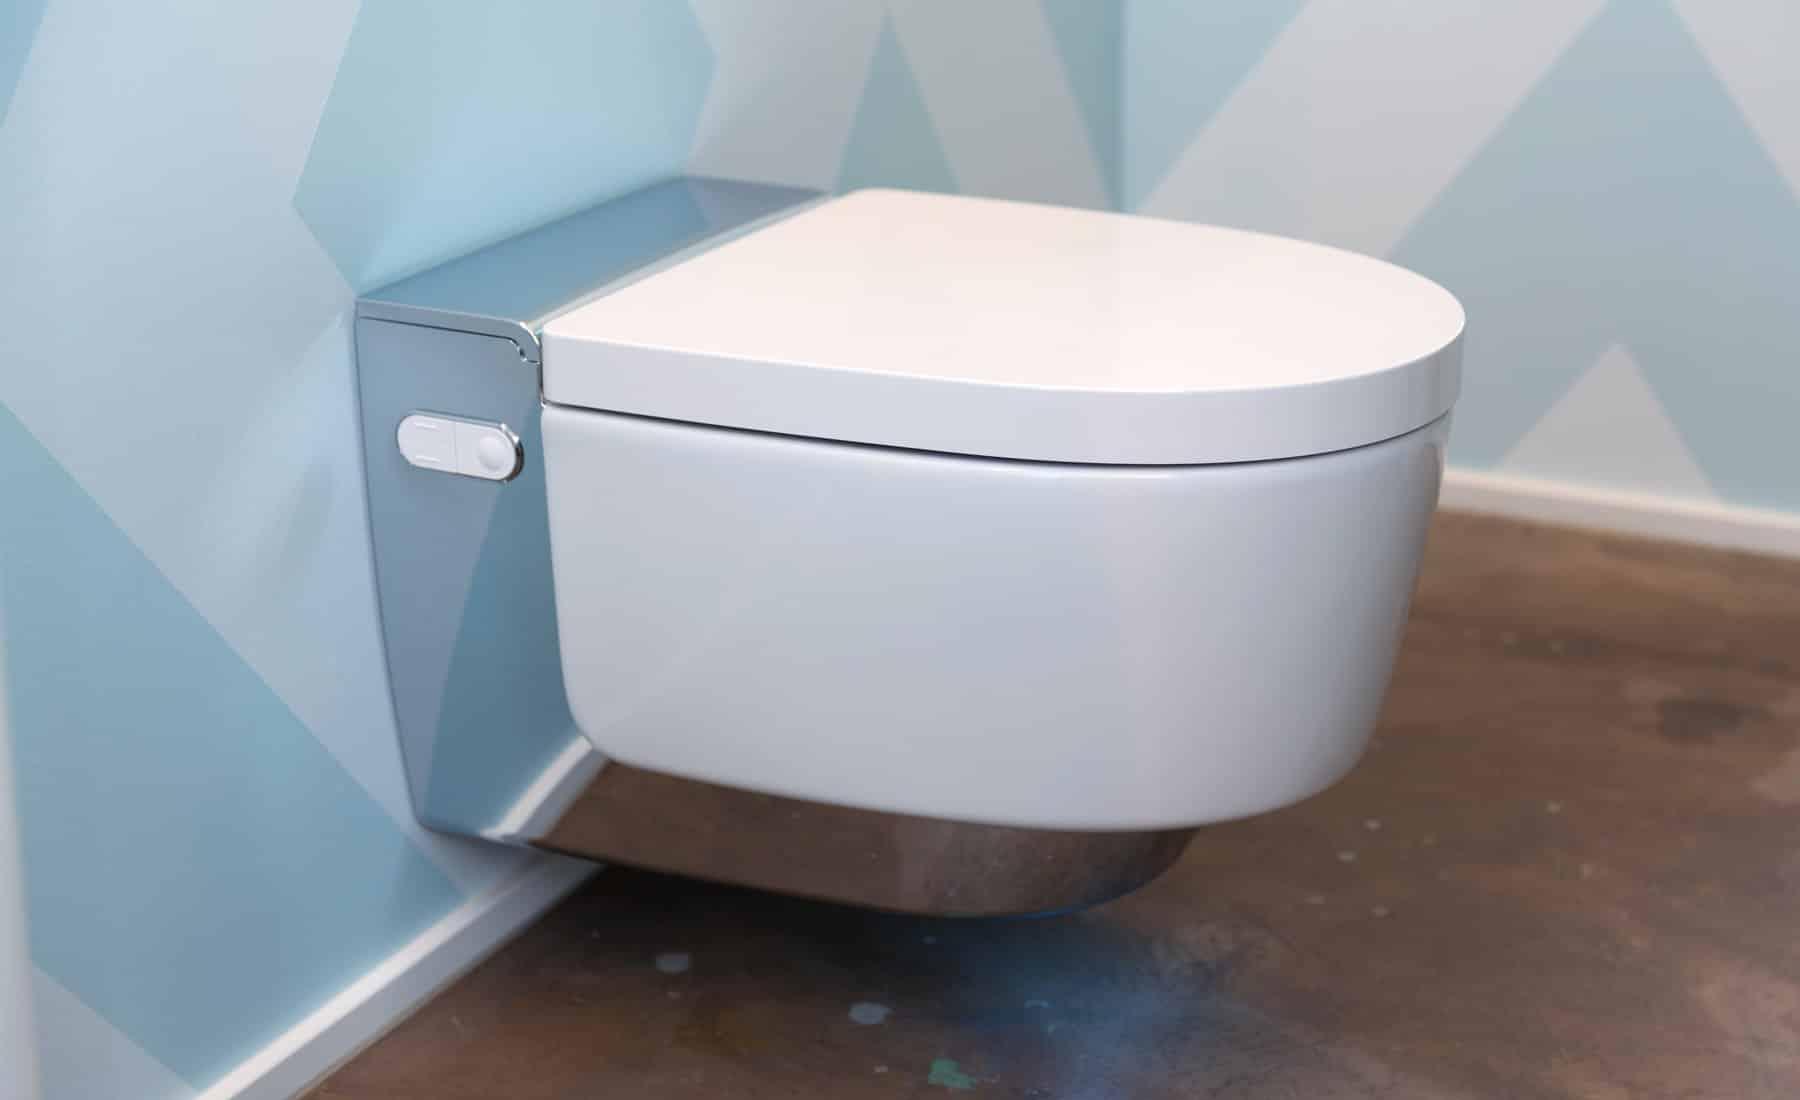 Geberit Toilet Prijs : Geberit aquaclean mera comfort frissebips